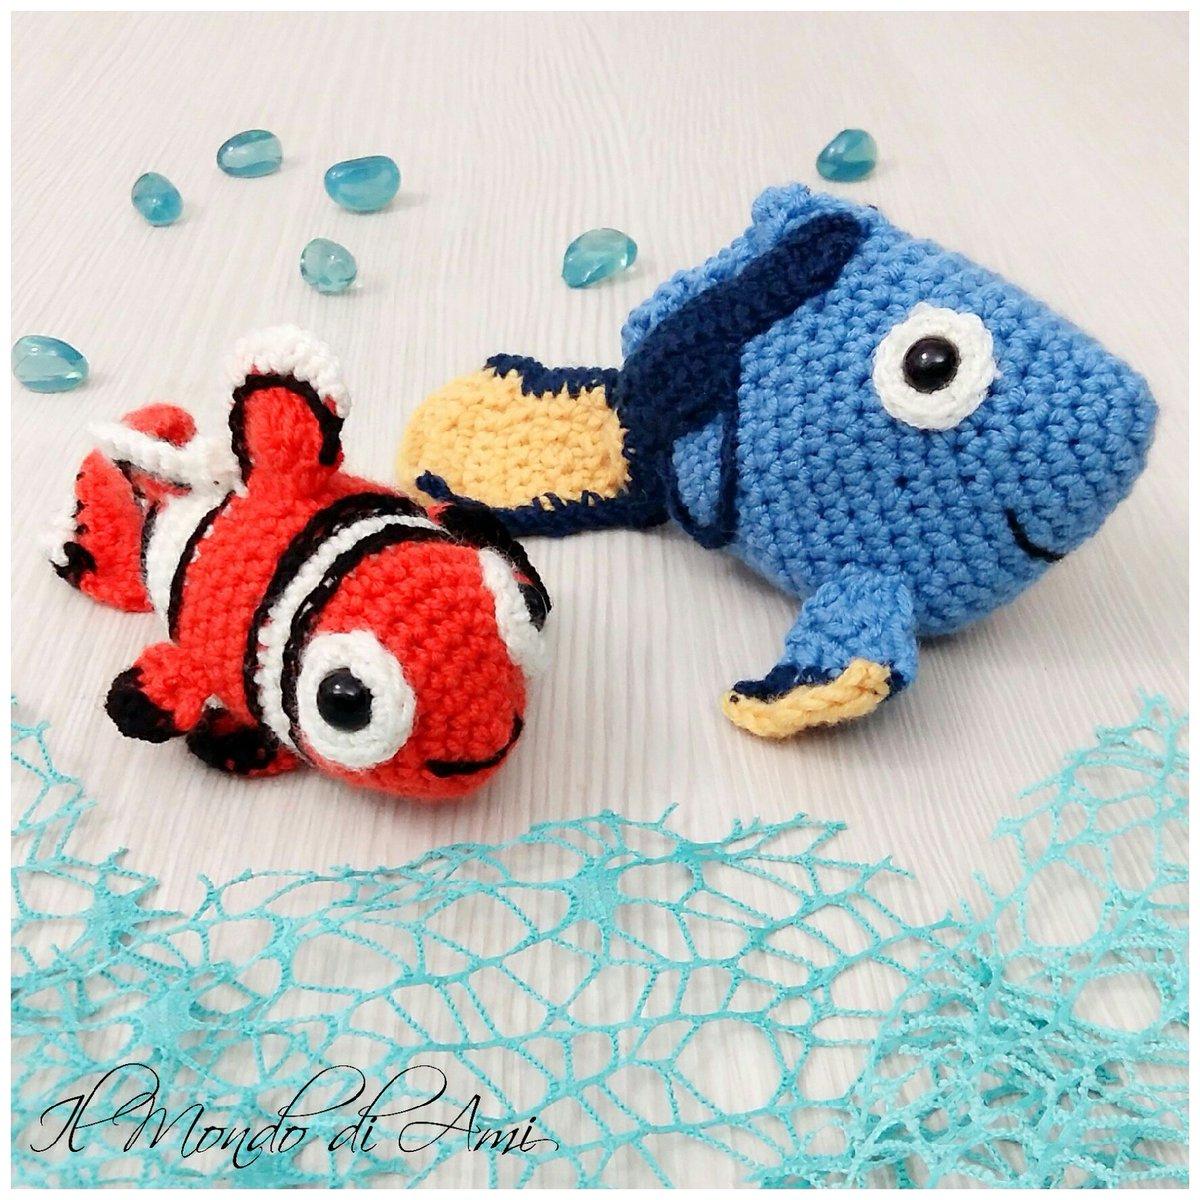 10+ Cutest Finding Dory Crochet Patterns | BeesDIY.com | 1200x1200